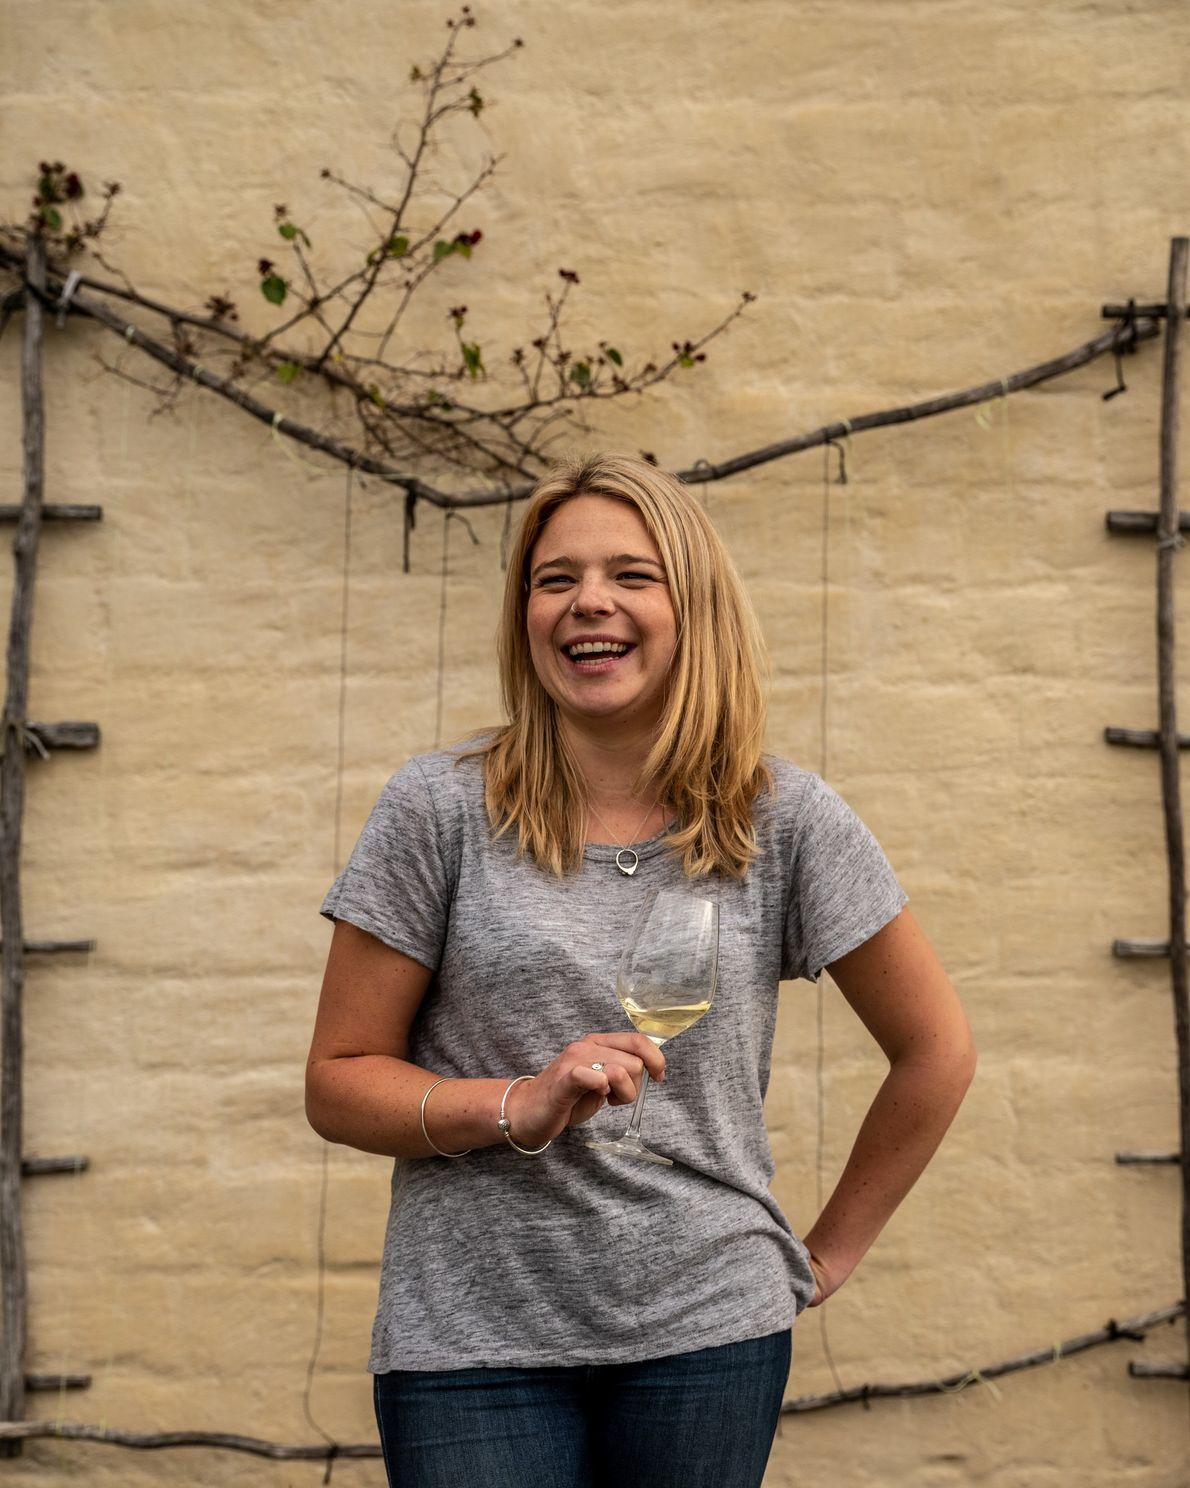 Rosie Finn at Neudorf Vineyards, one of many in Nelson Tasman's boutique wine region. This 39-year-old ...